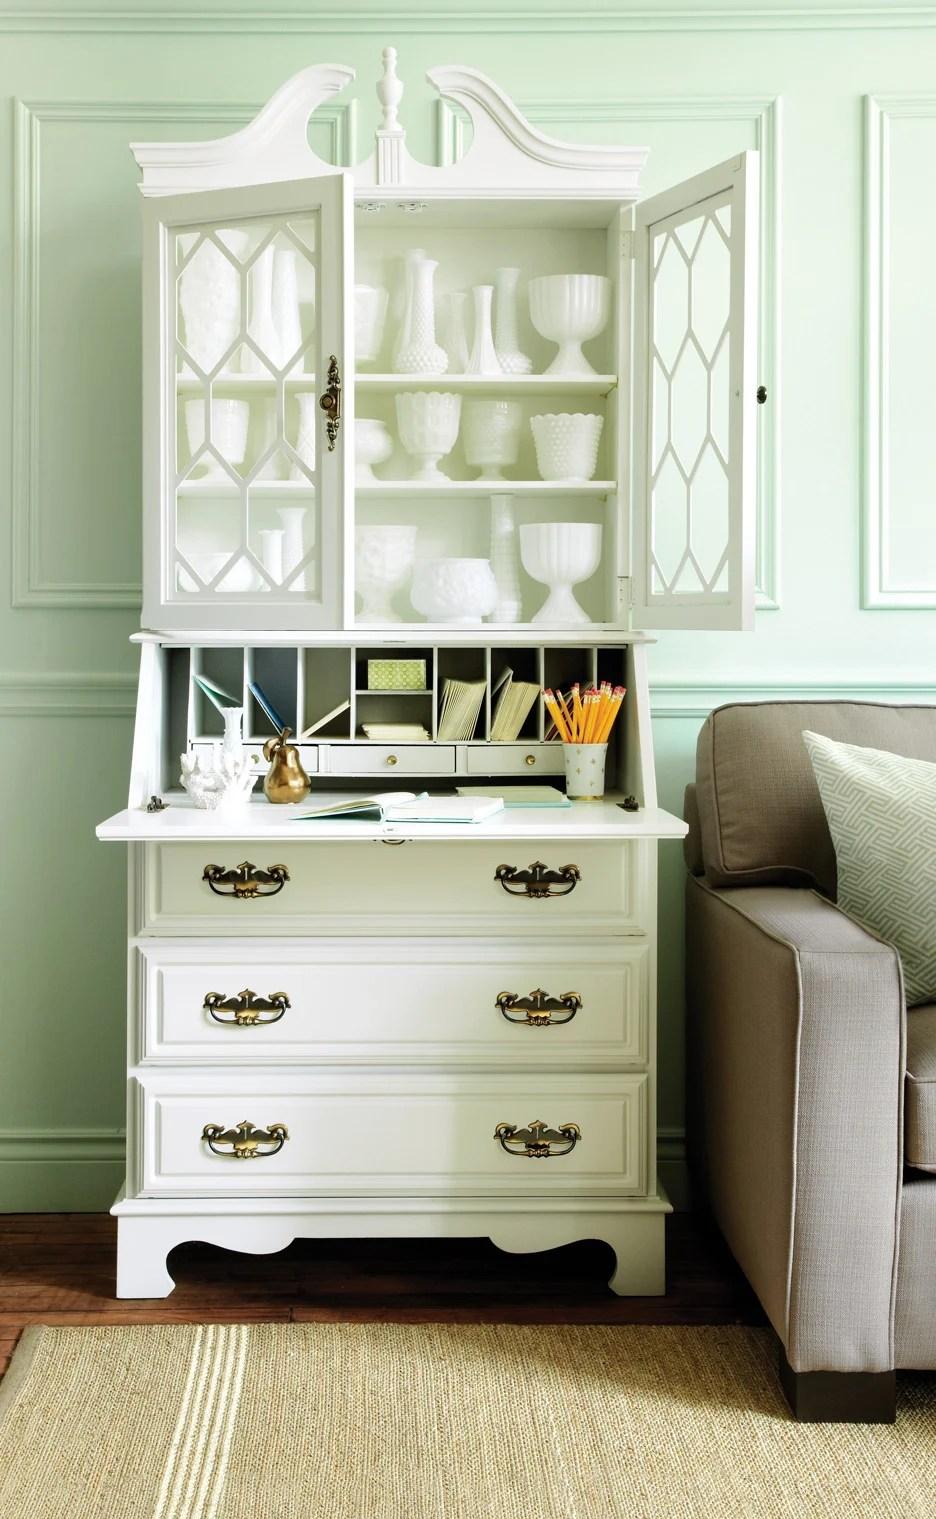 Home office idea How to turn a bookcase bureau into an